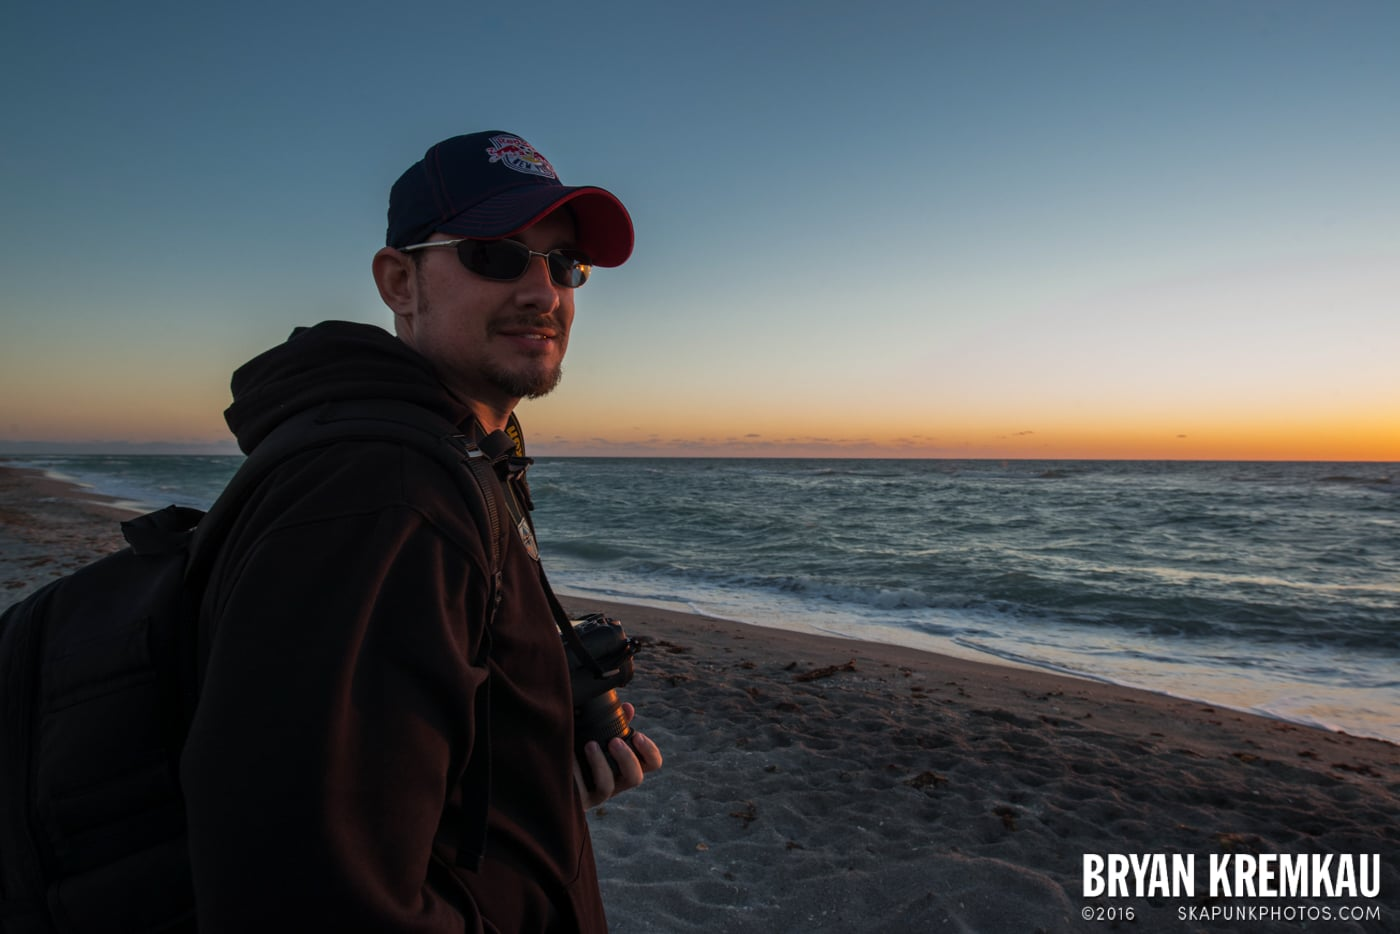 Sunsets, Astrophotography & Birds @ Venice, Florida - 10.25.14 - 11.5.14 (98)